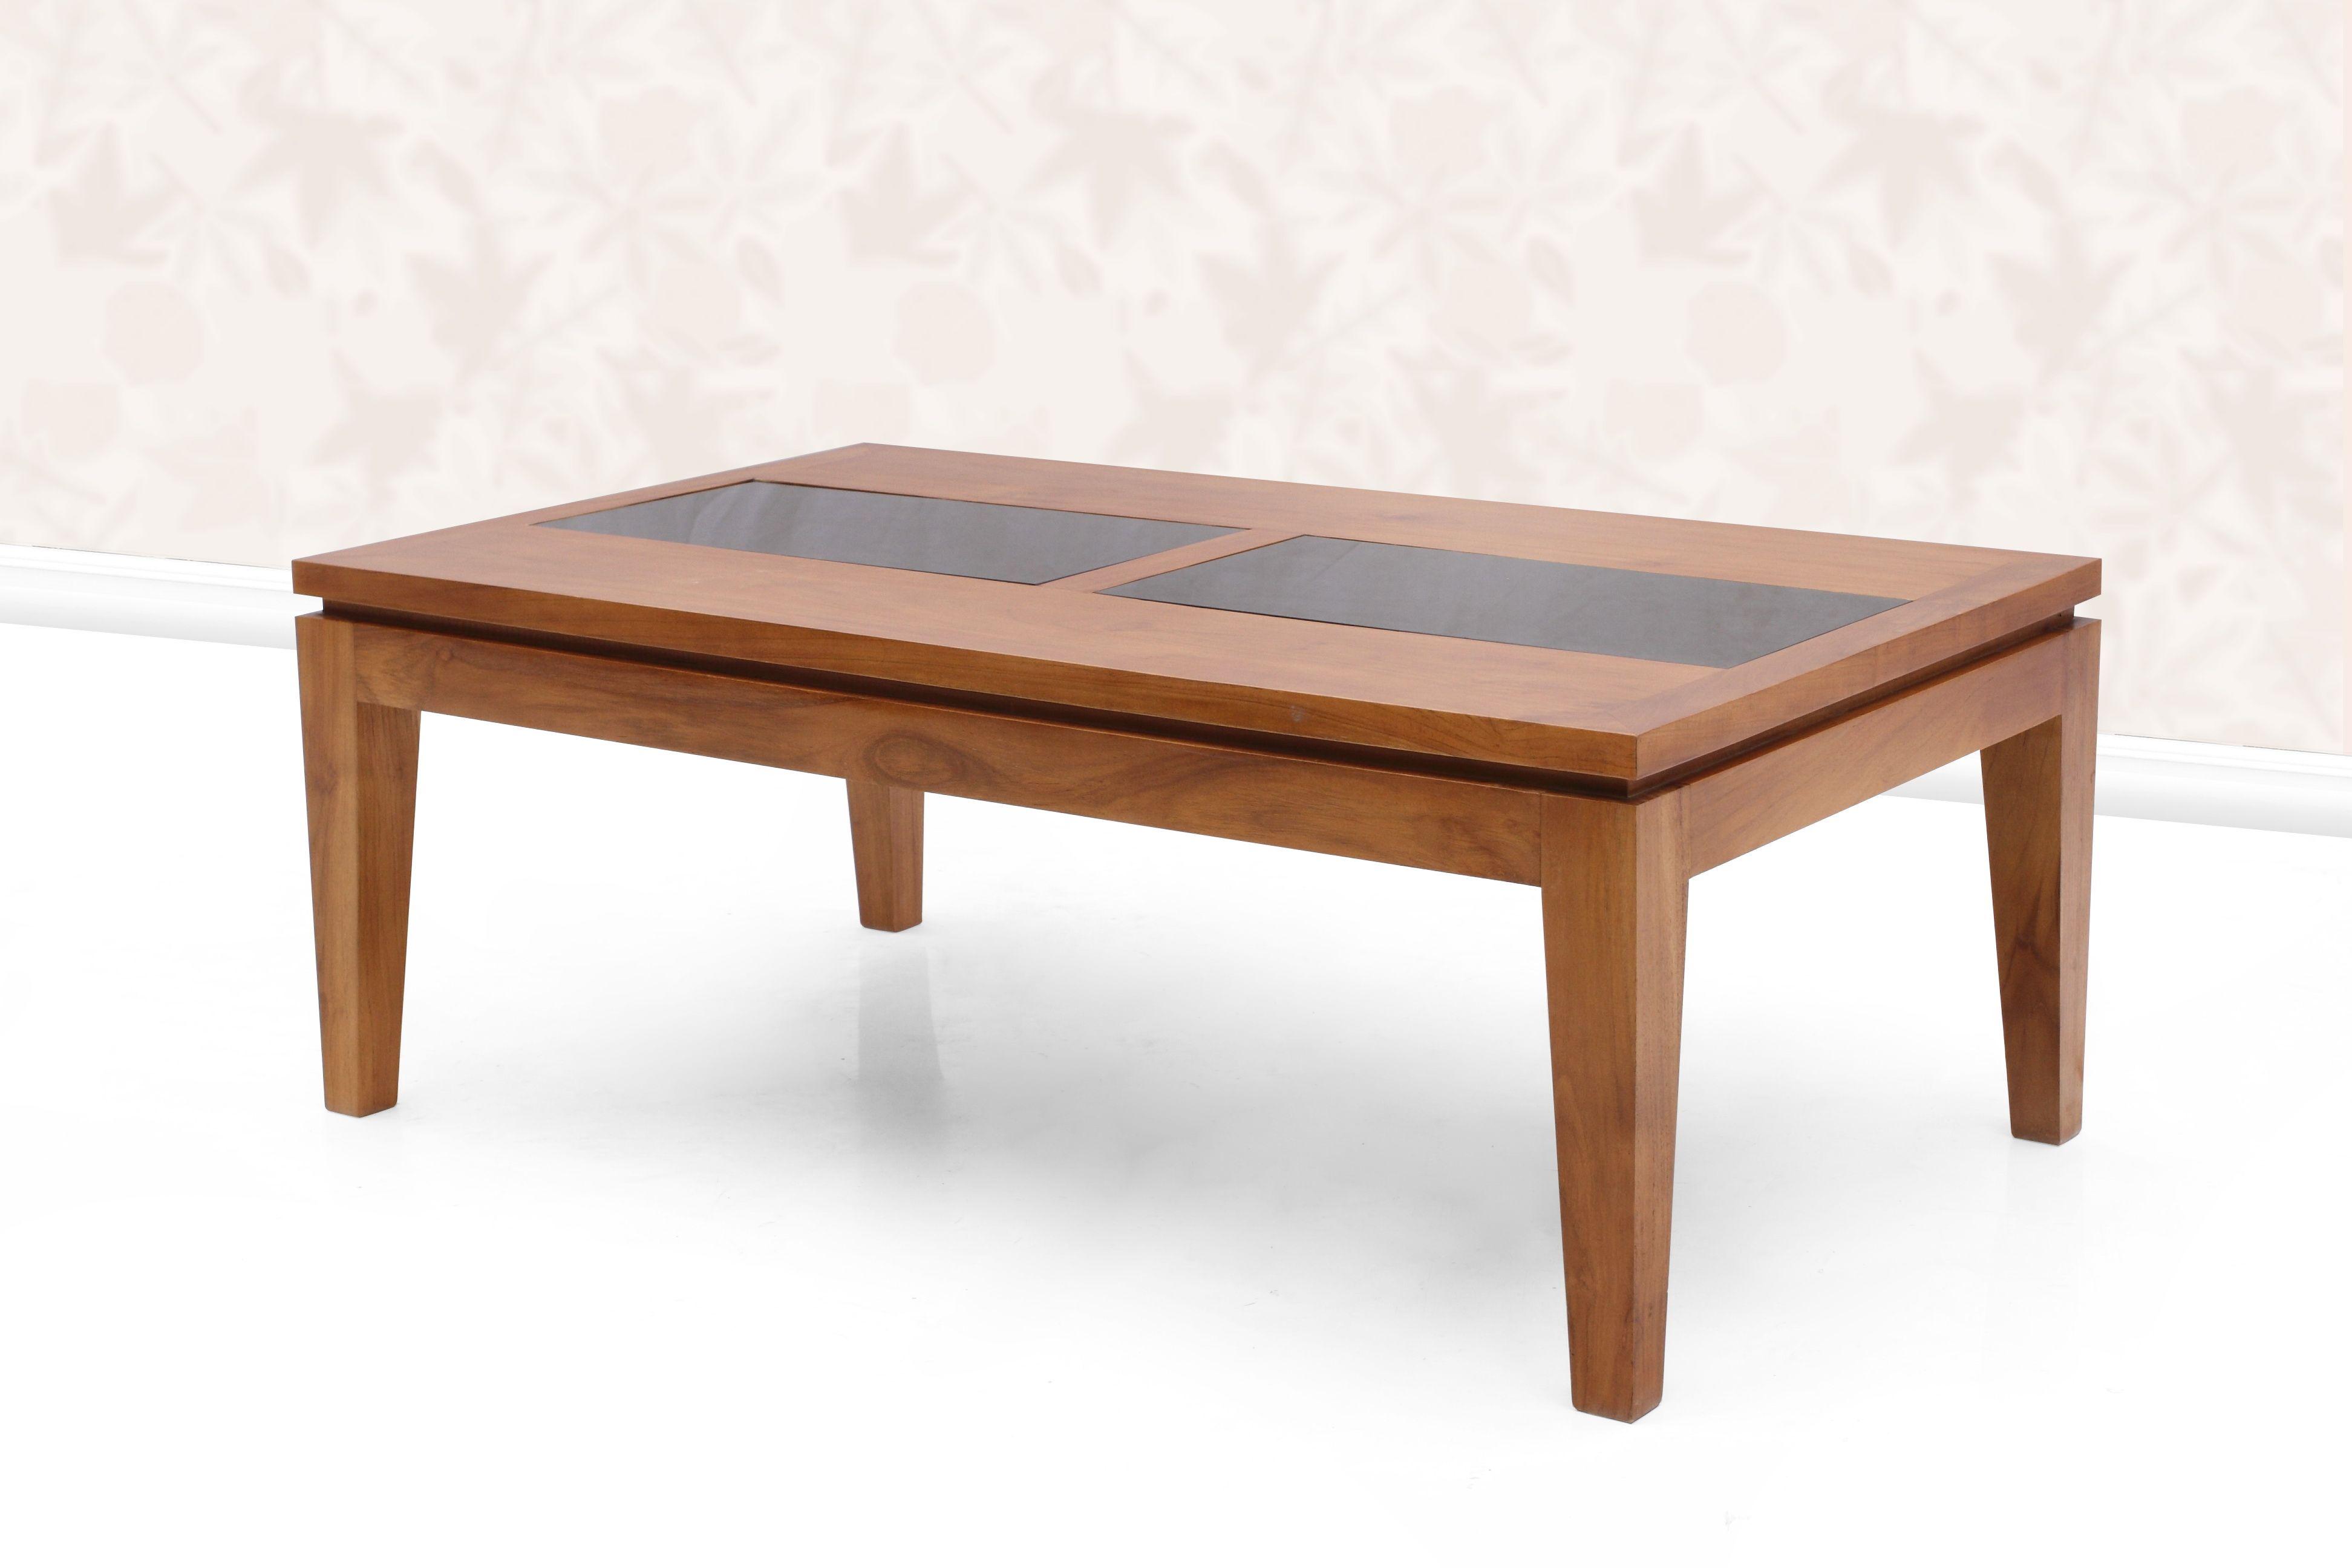 Teak Furniture Malaysia Teak Wood Furniture Shop Selangor Malaysia Coffee Table Wood Teak Furniture Teak Wood